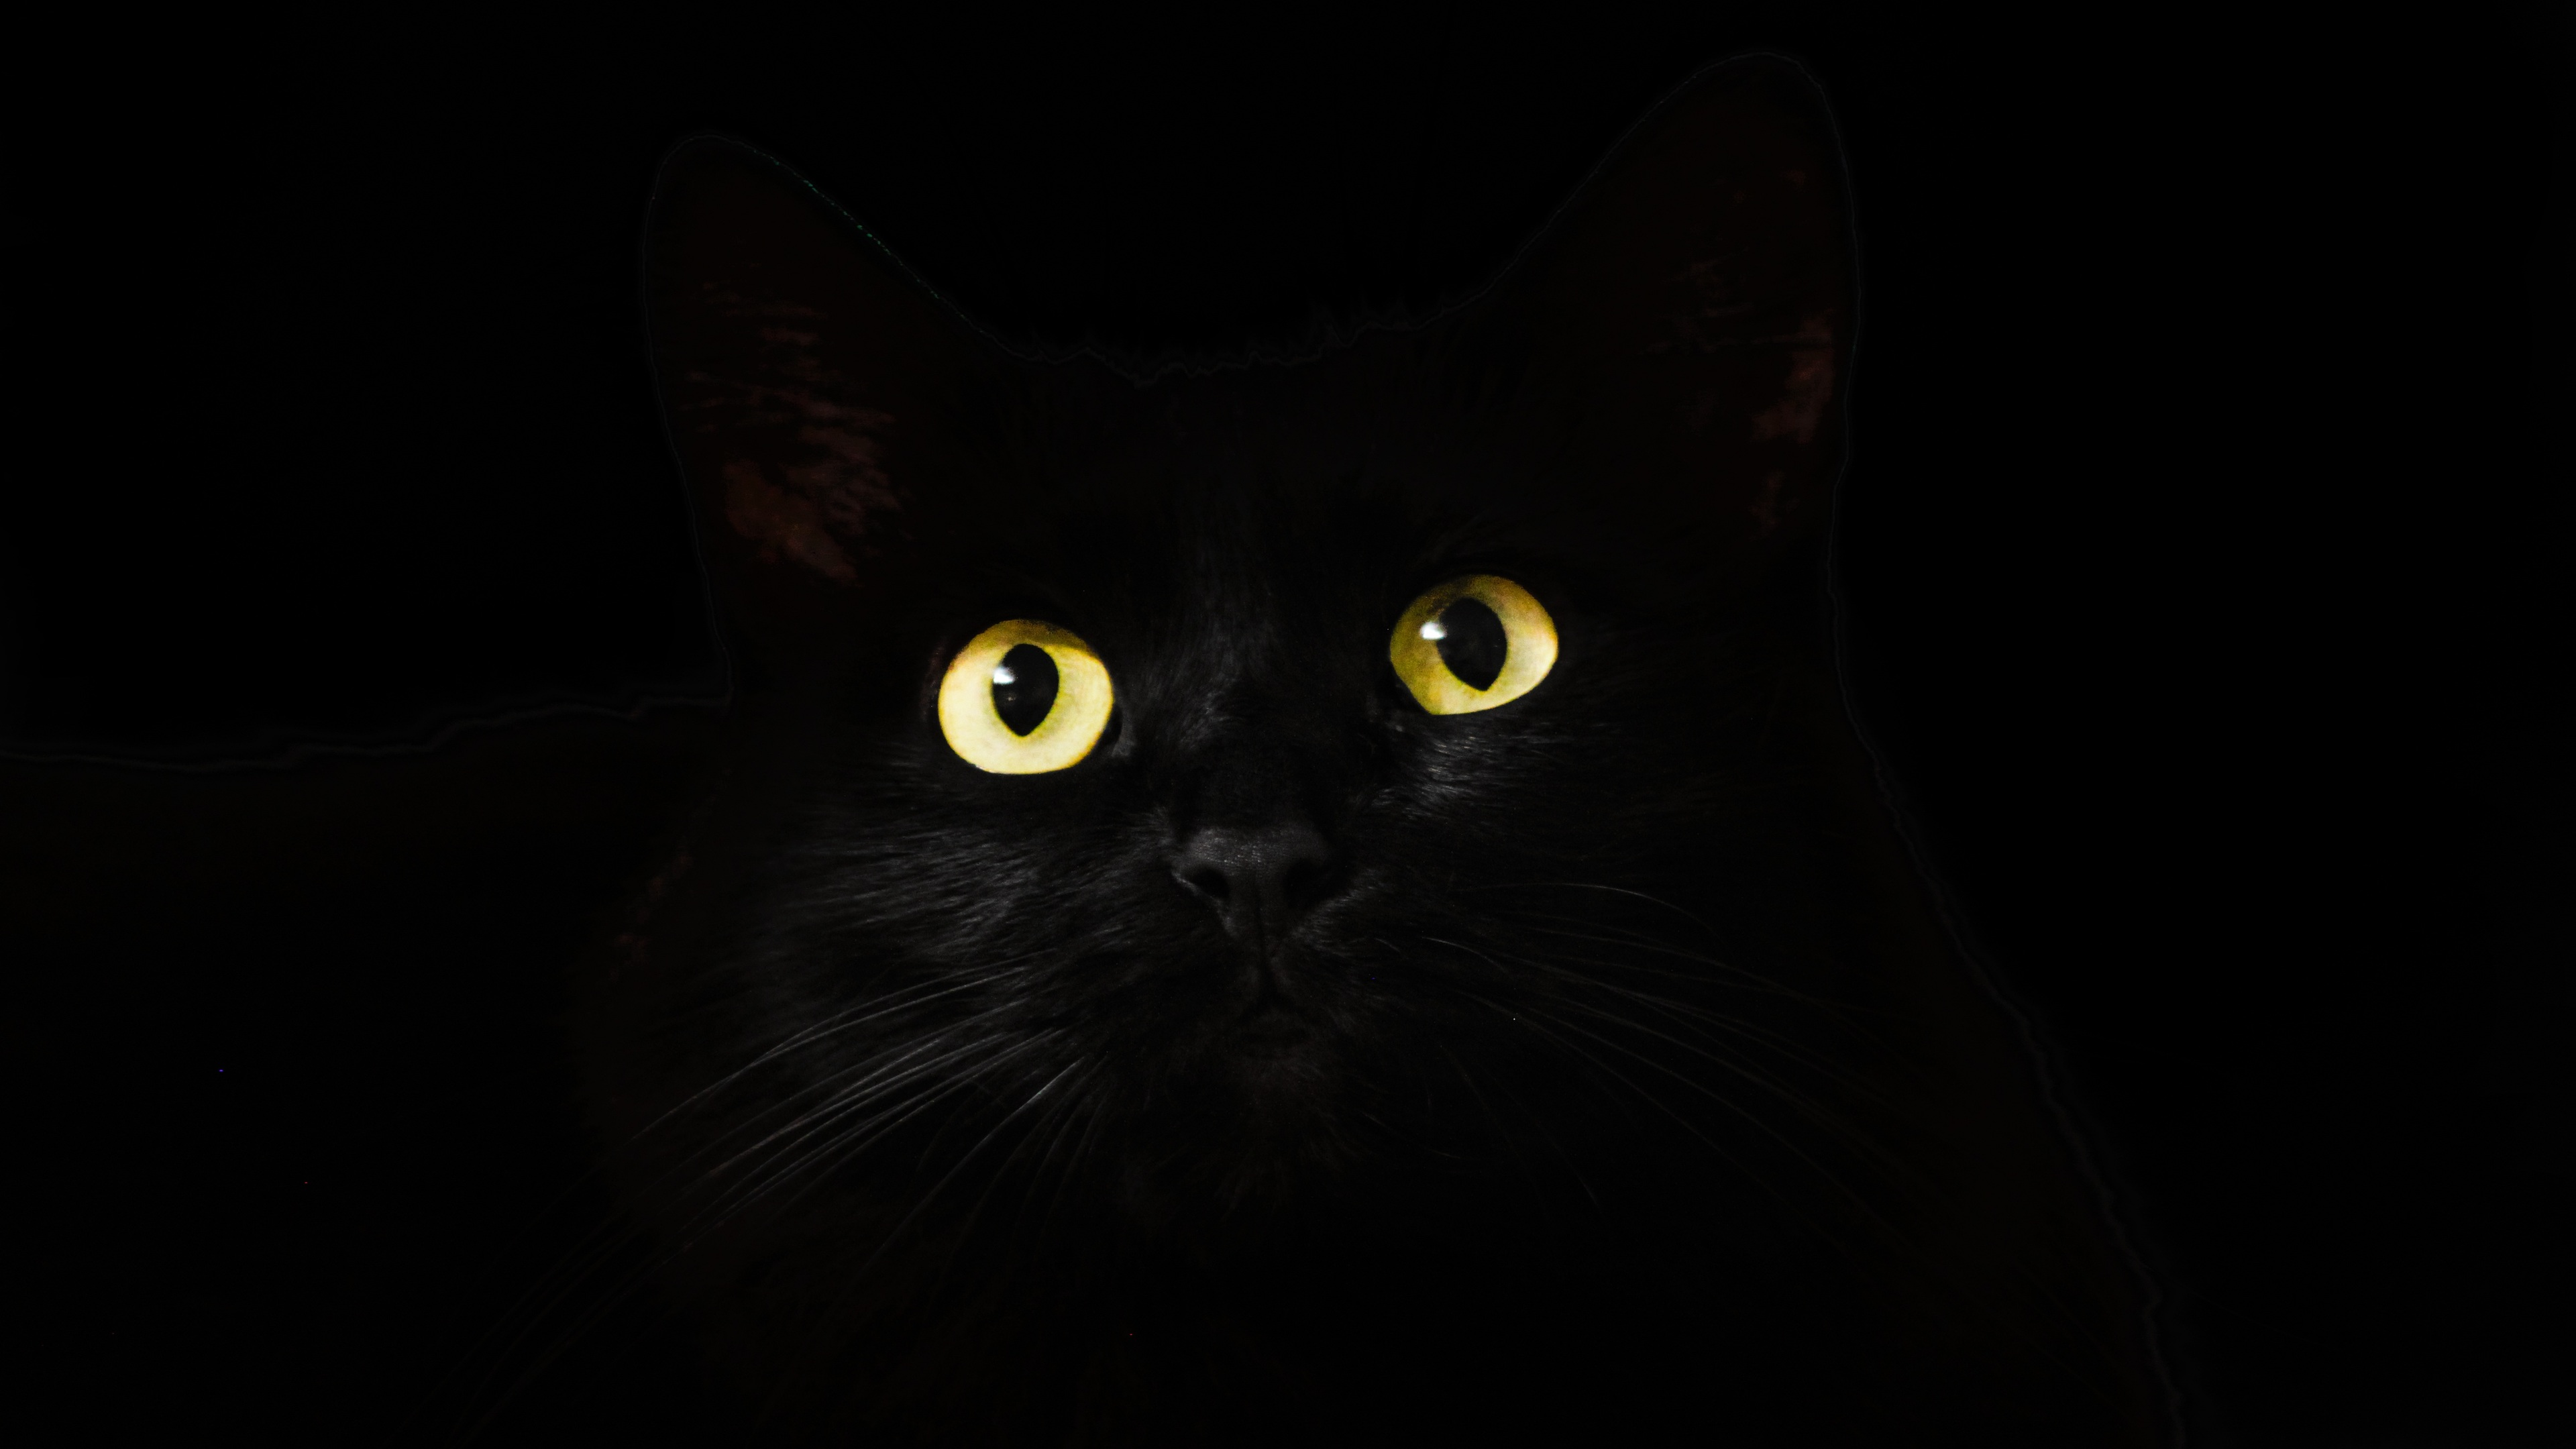 black cat eyes dark 4k 1542238611 - Black Cat Eyes Dark 4k - hd-wallpapers, eyes wallpapers, cat wallpapers, animals wallpapers, 4k-wallpapers